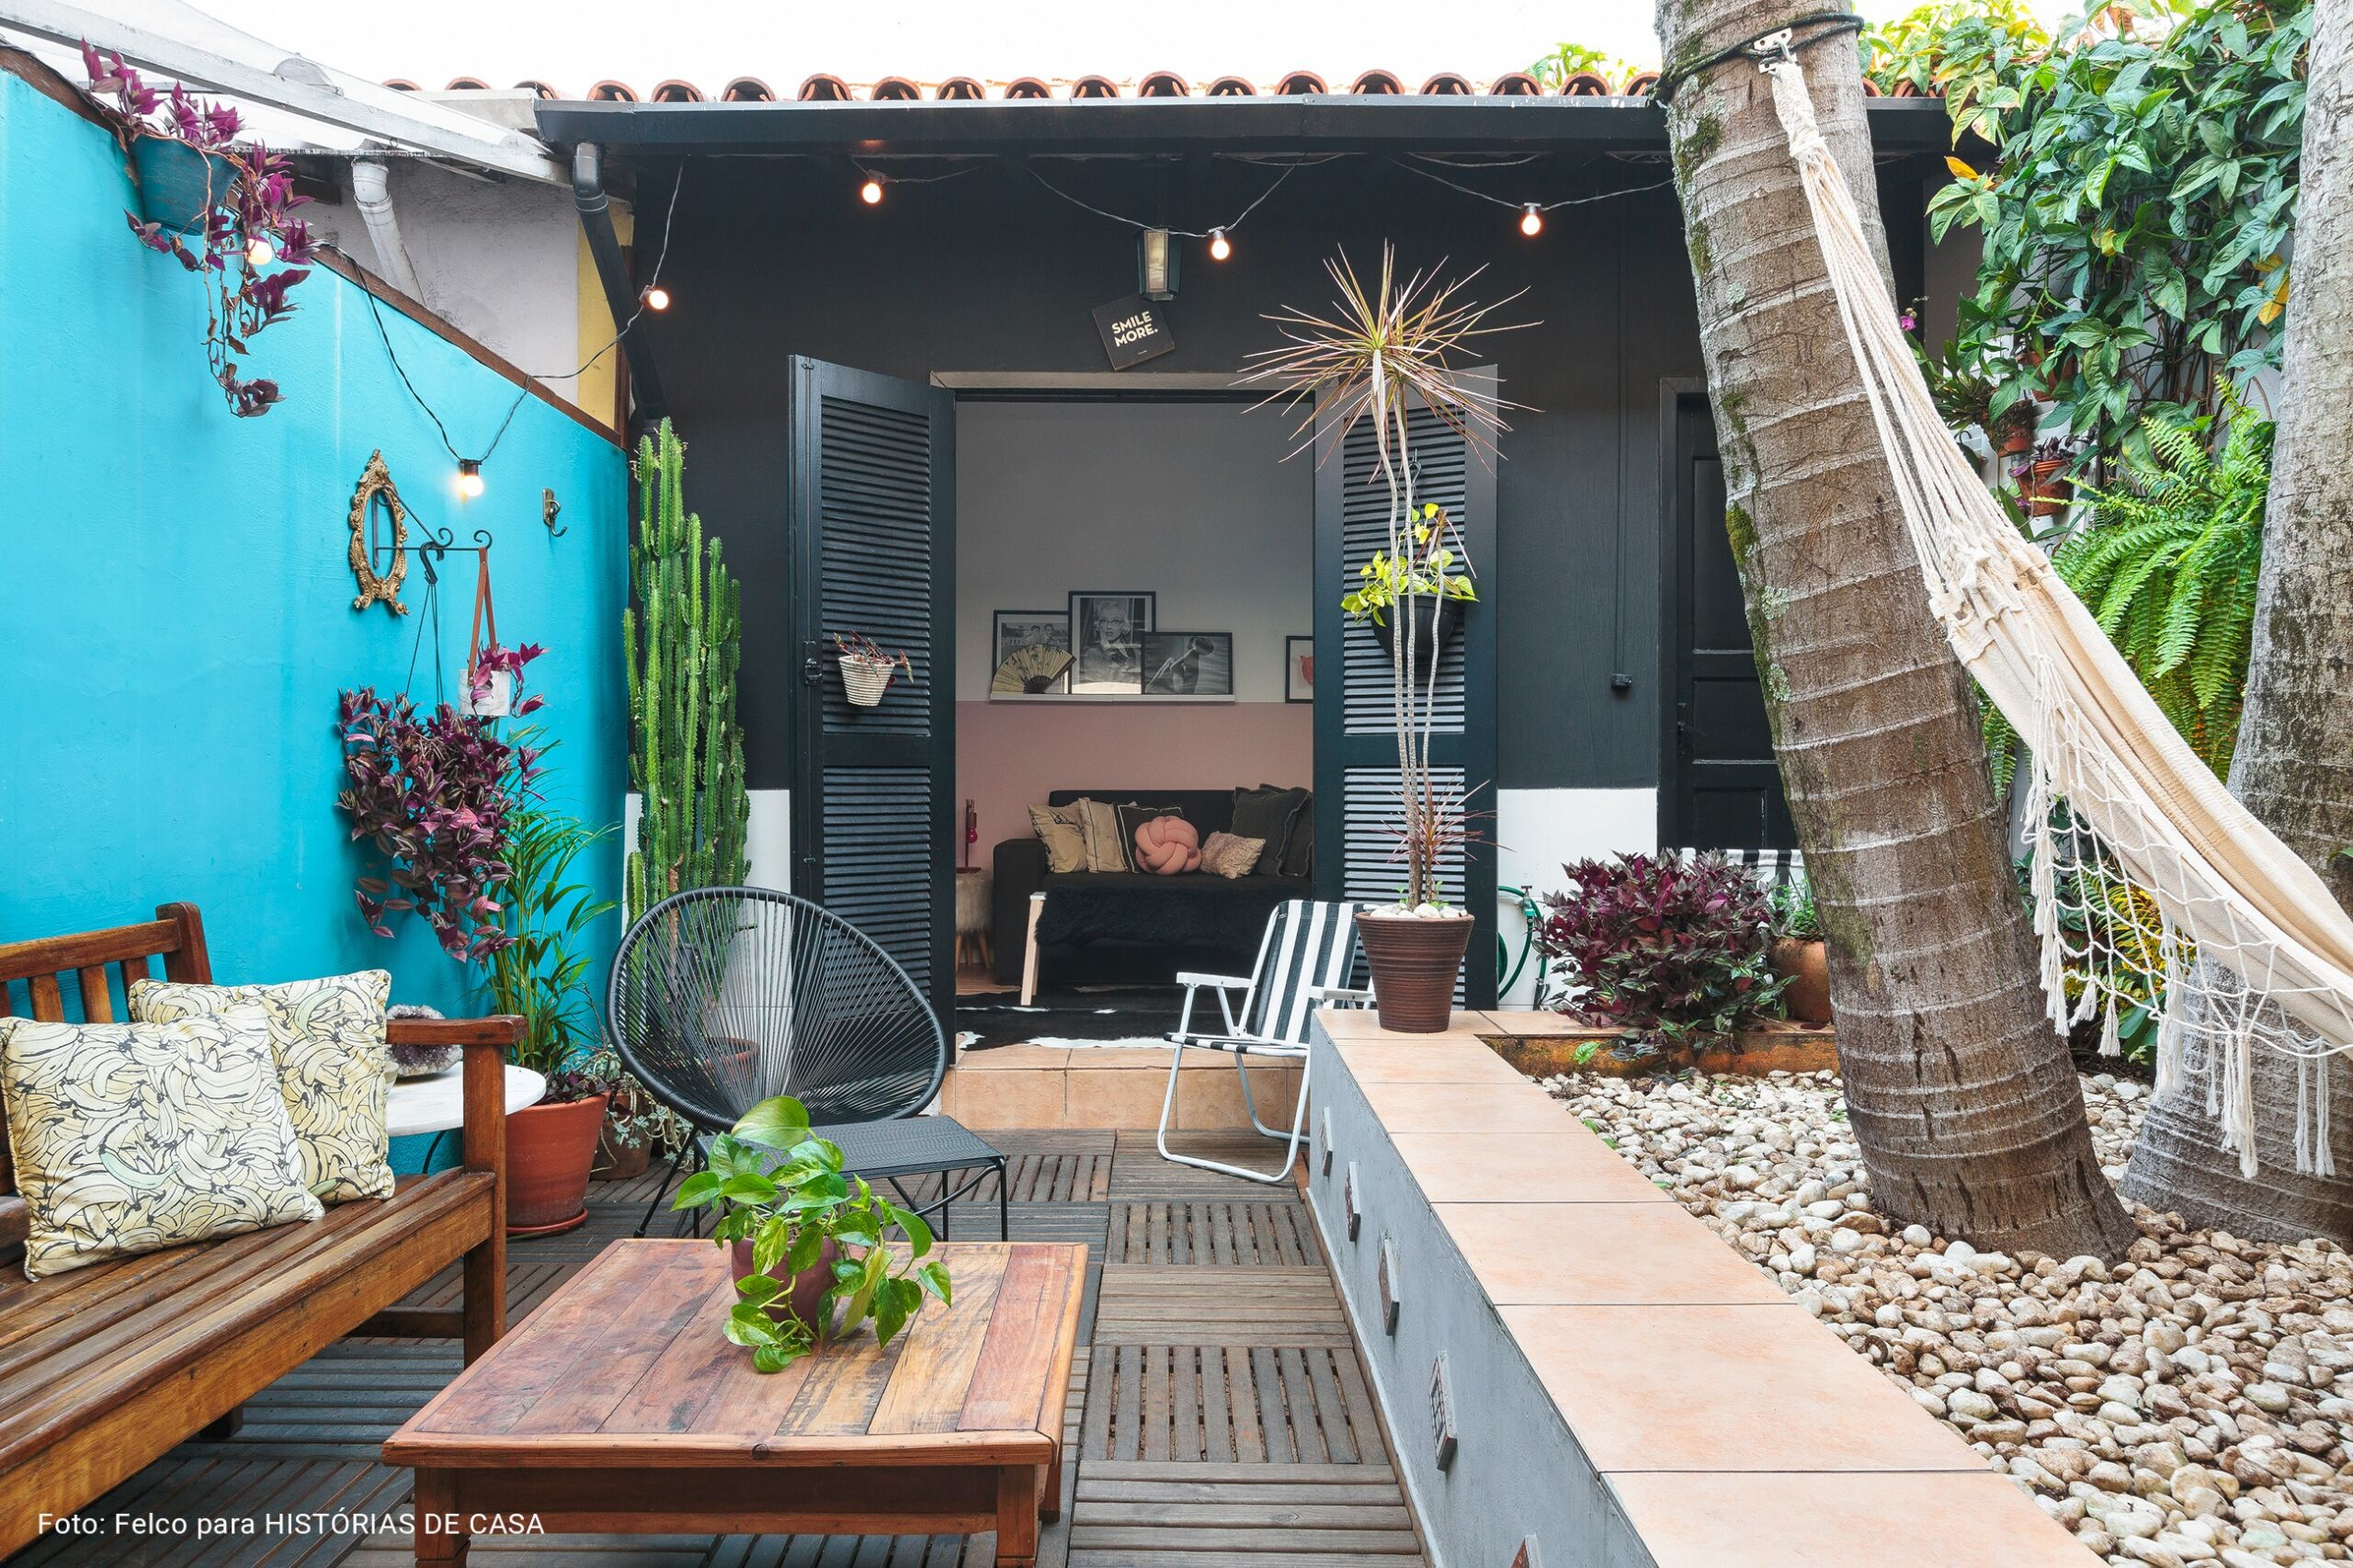 Casa de vila com estilo industrial e paredes coloridas